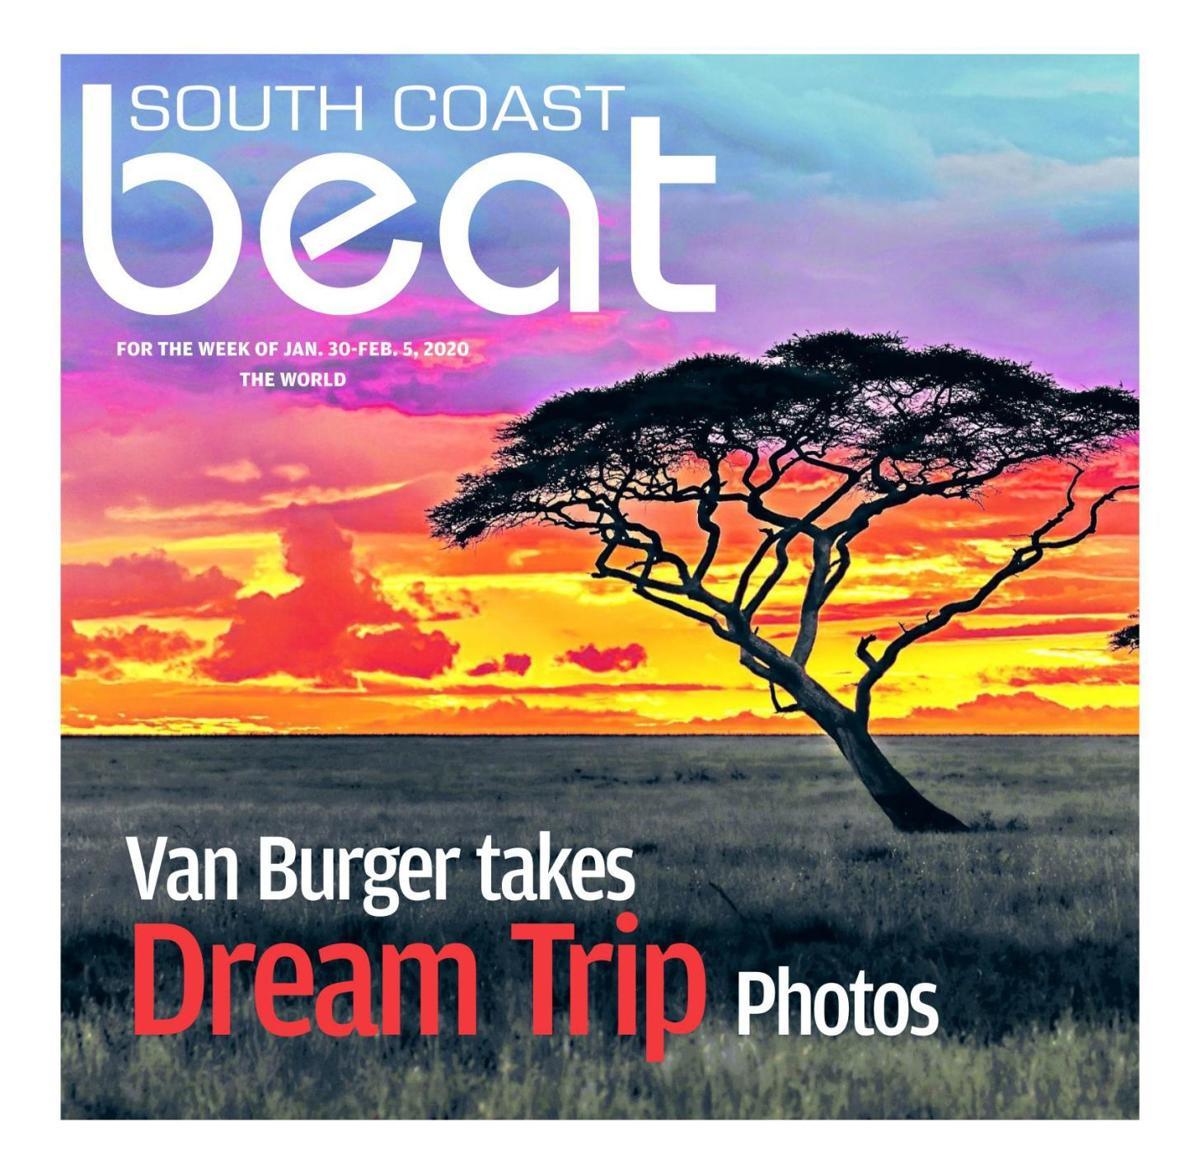 South Coast Beat, Jan. 30, 2020